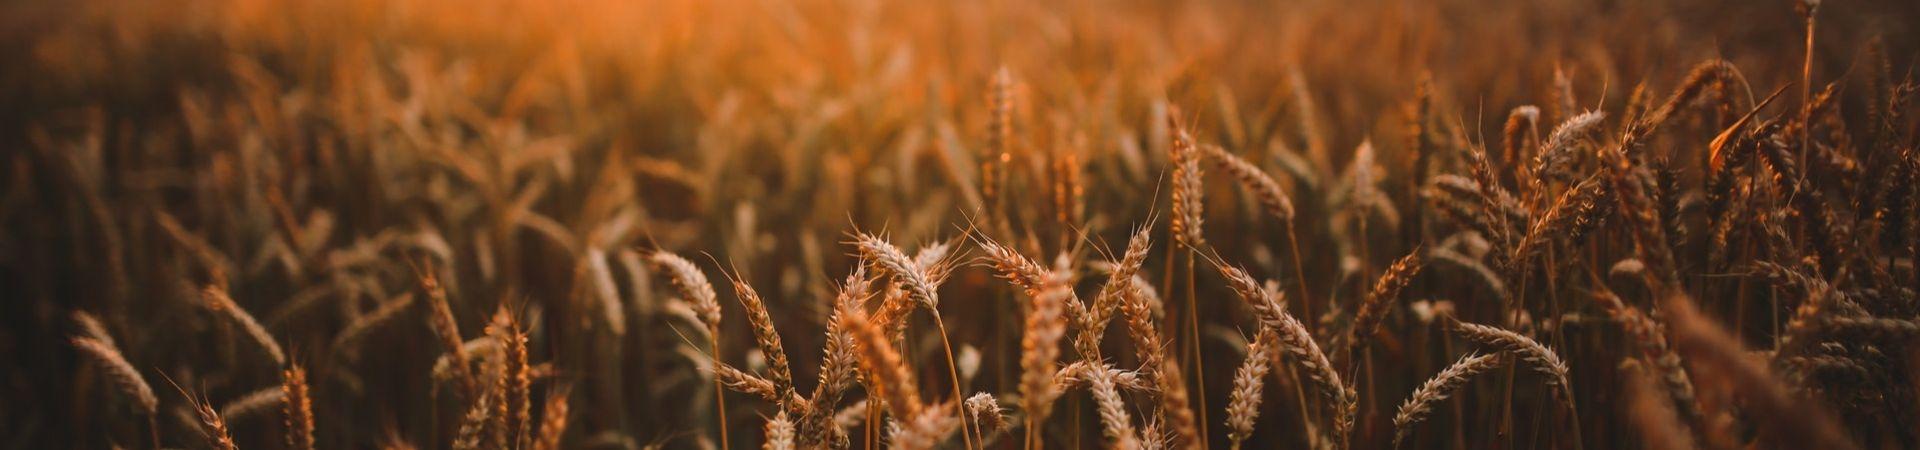 Food-sunset-love-field